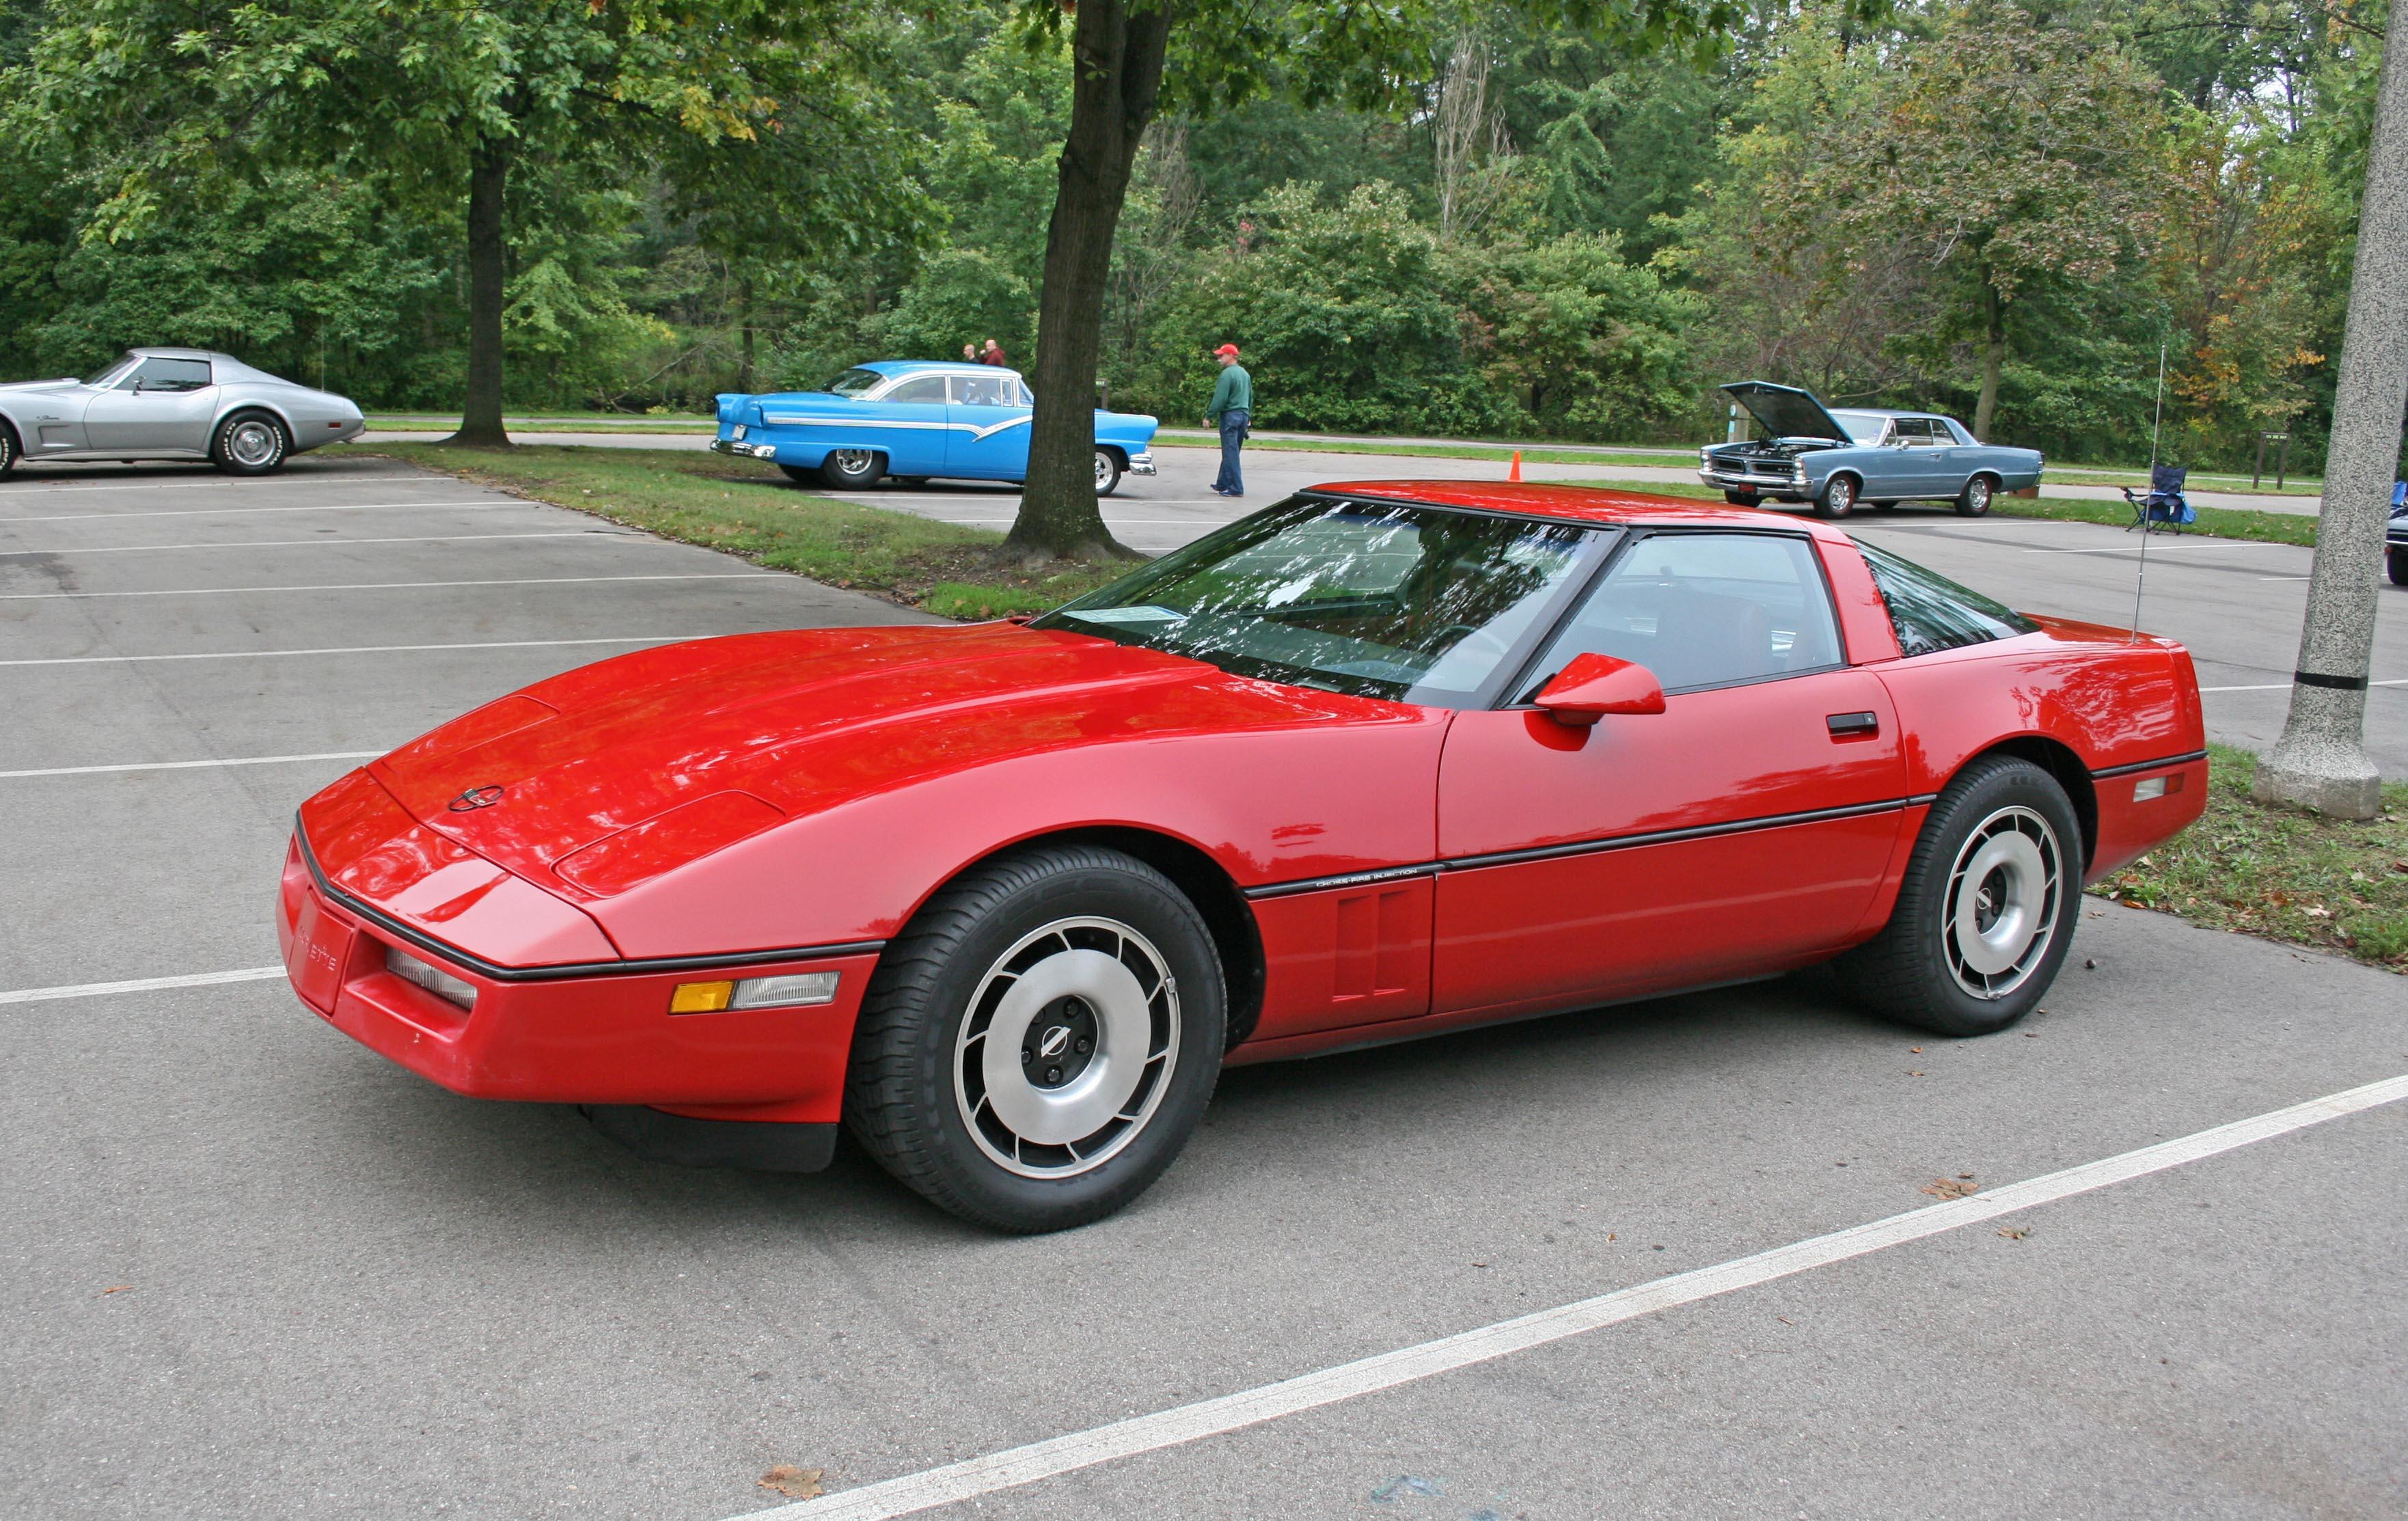 1984 Corvette Custom_zfPpqq1tBTLtanRKu3gijYdS7DQhC*o6DgAEmhO9xbkon 1984 Corvette Crossfire Injection Engine